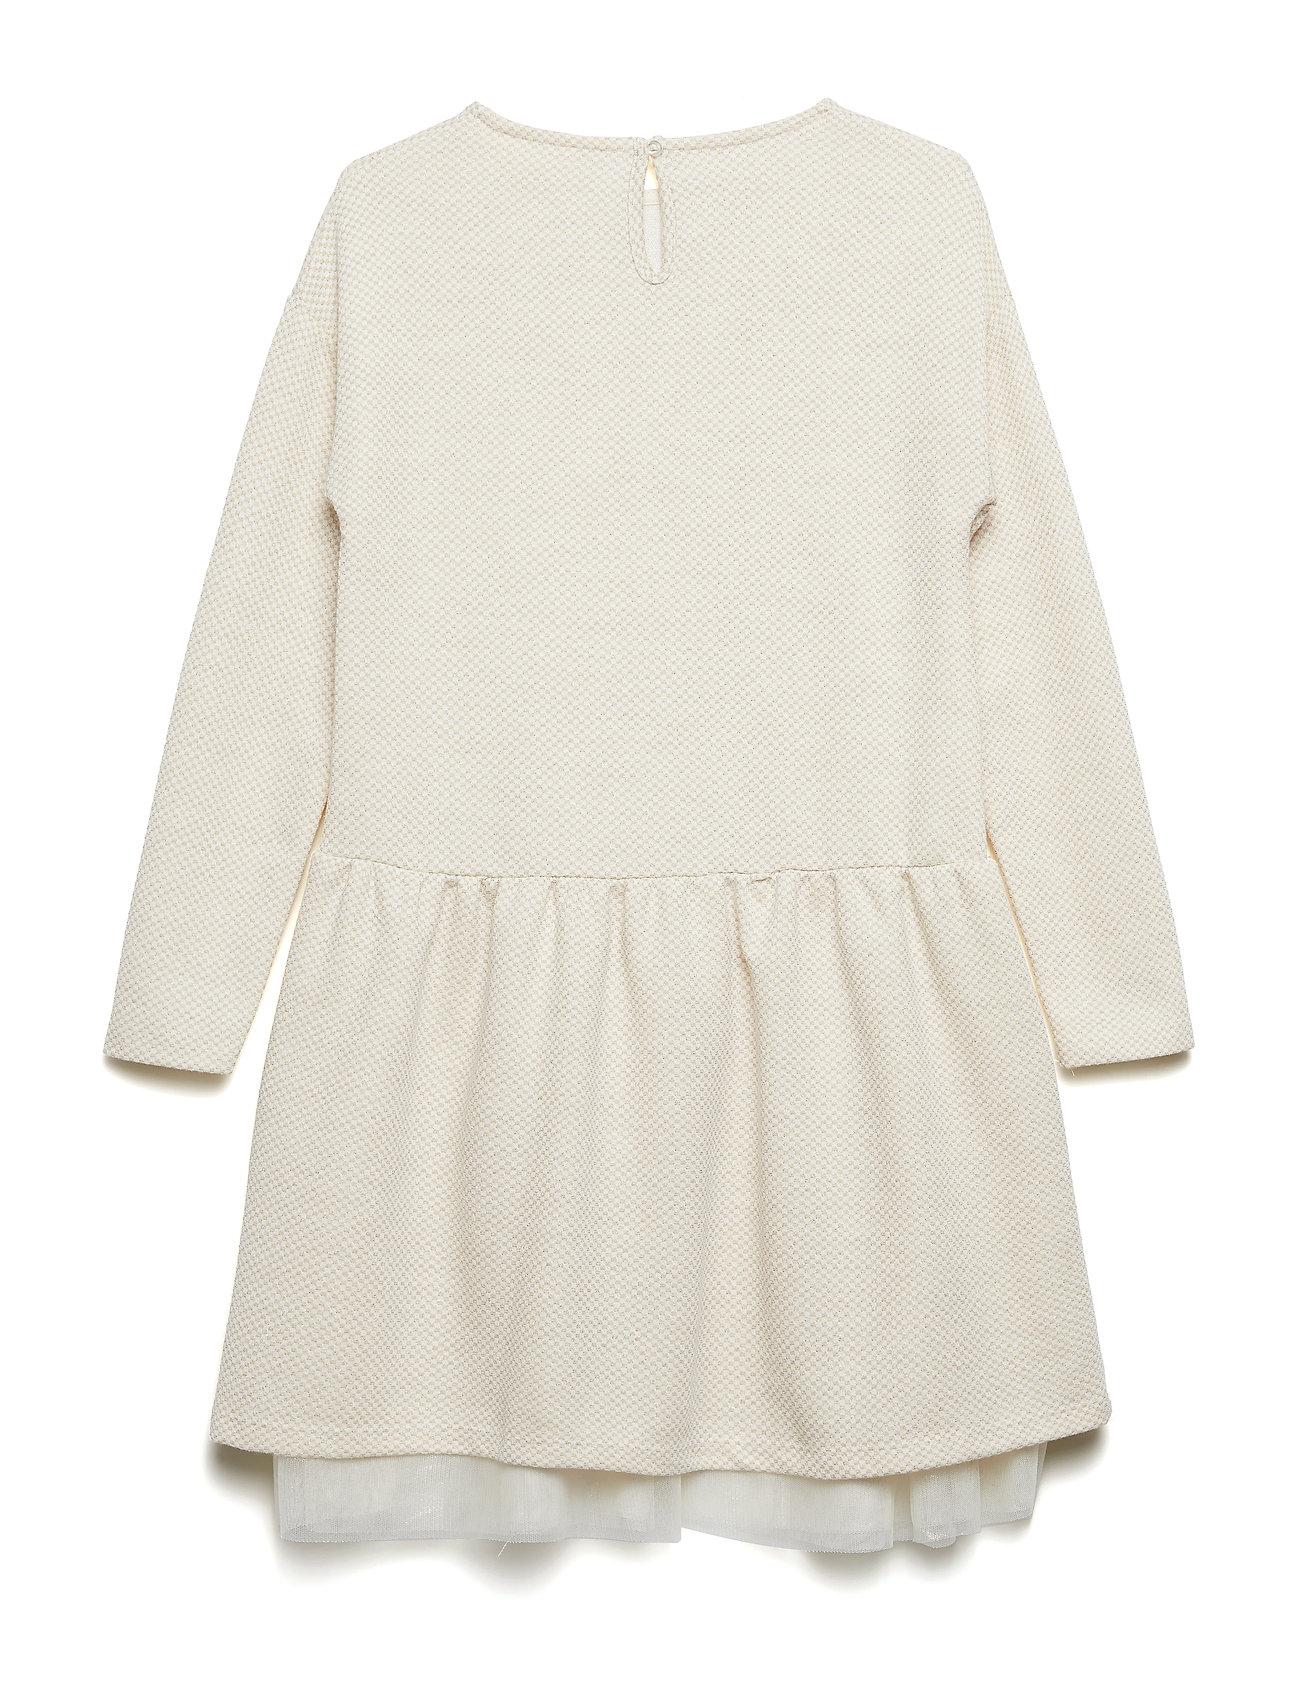 a710af6e2 Tulle Metallic Dress Kjole Creme MANGO KIDS